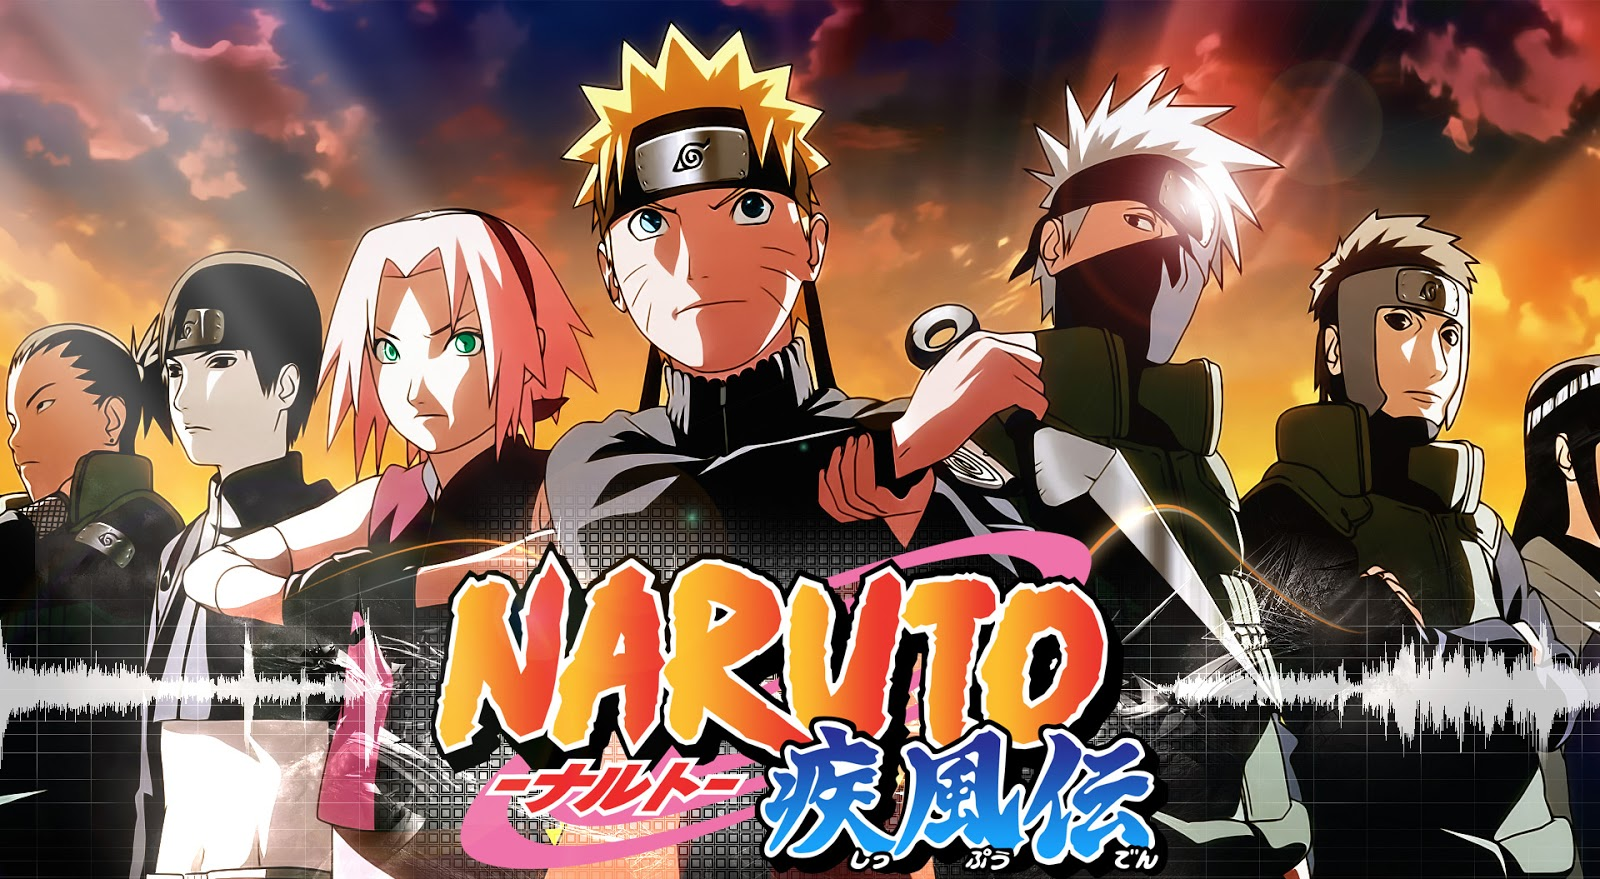 Naruto Shippuden Full Episode | New Games